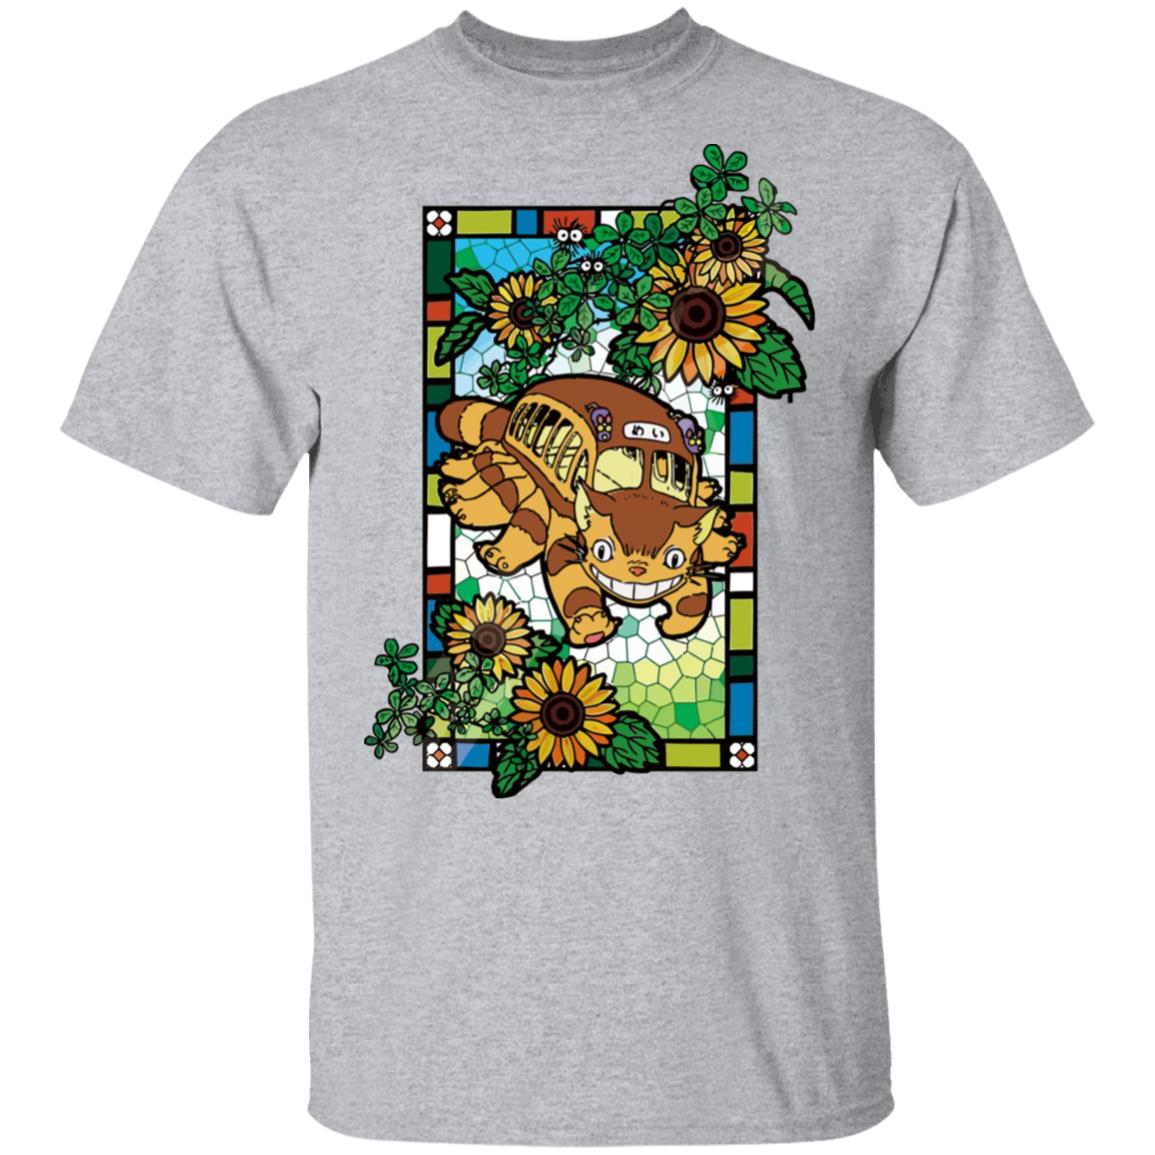 My Neighbor Totoro – Cat Bus Stained Glass Art T Shirt